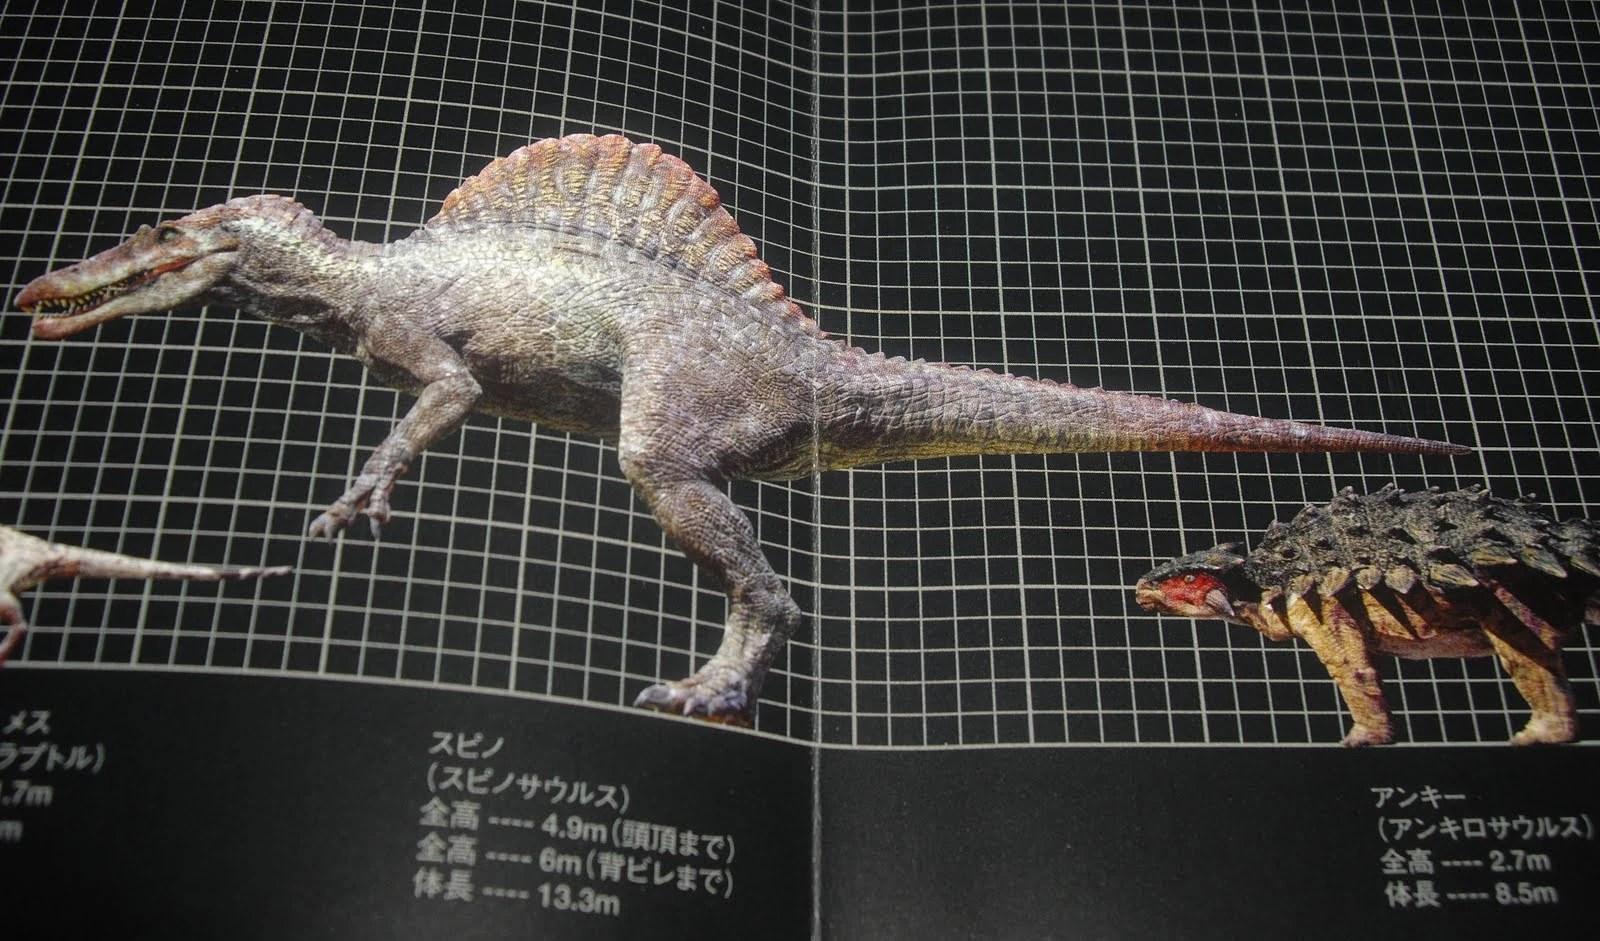 Spinosaurus japanese posterg also image jurassic park wiki rh jurassicparka